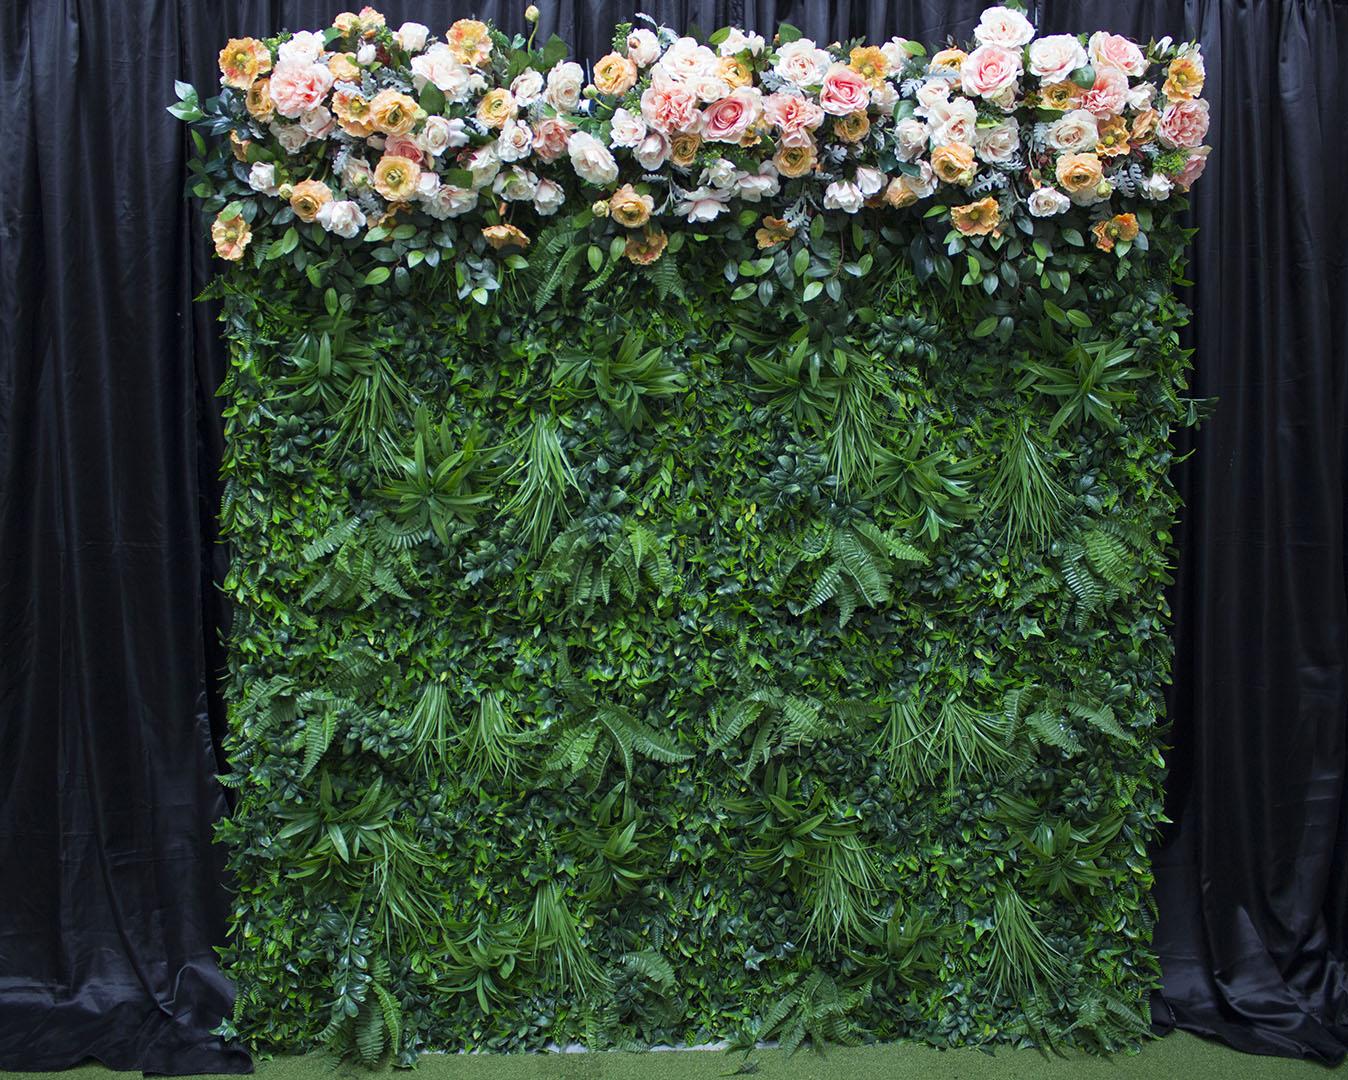 Sherbert Greenery Wall